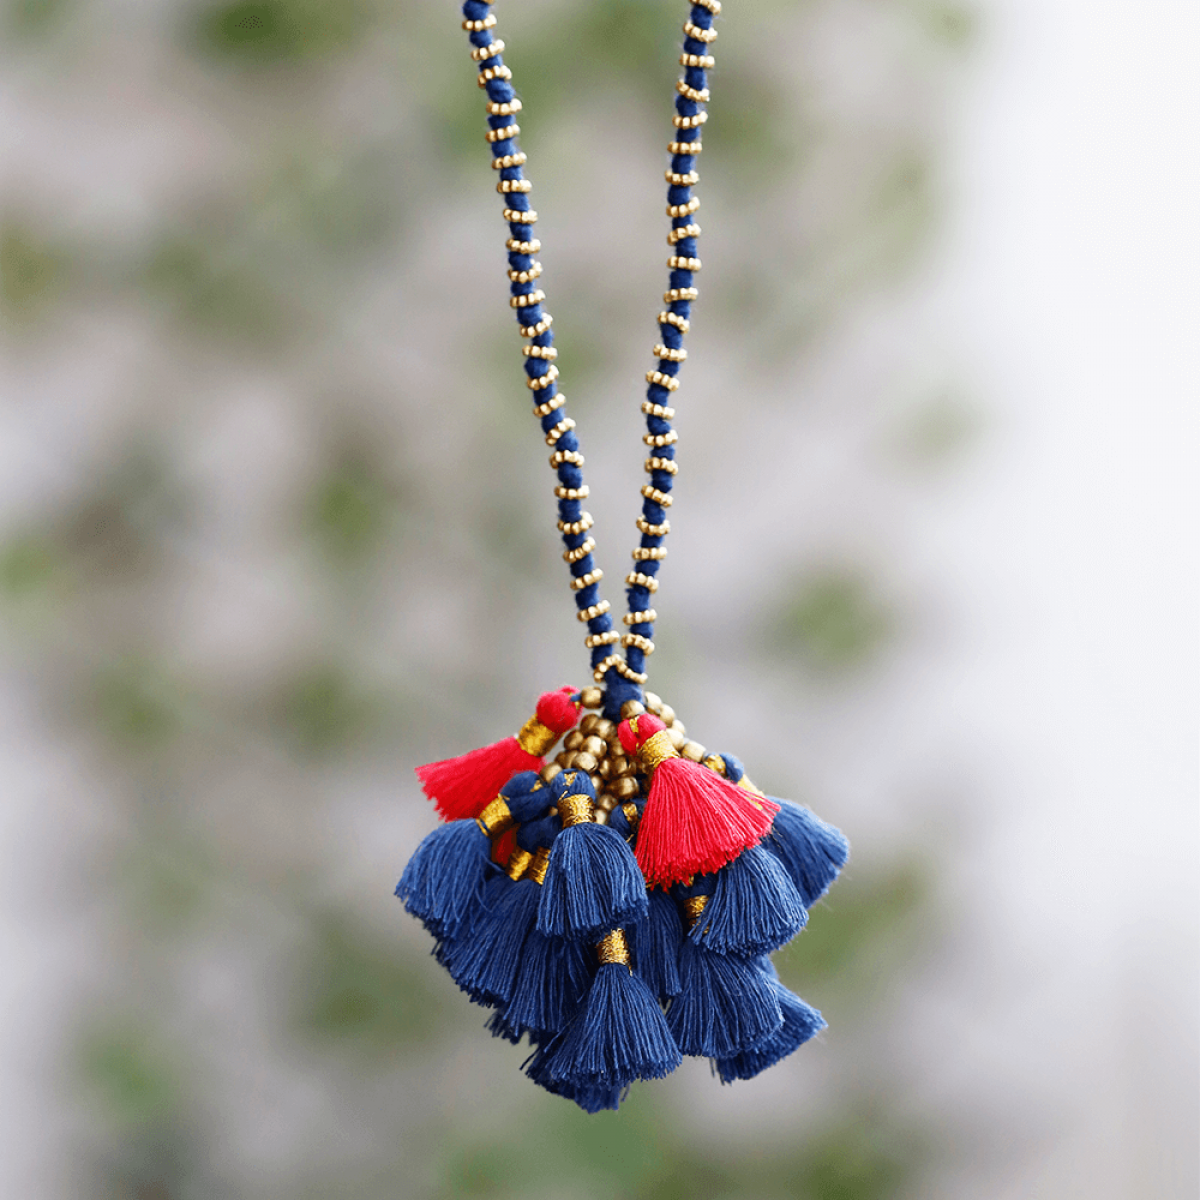 Bohemian Tassel Cluster Necklace - Black & Red